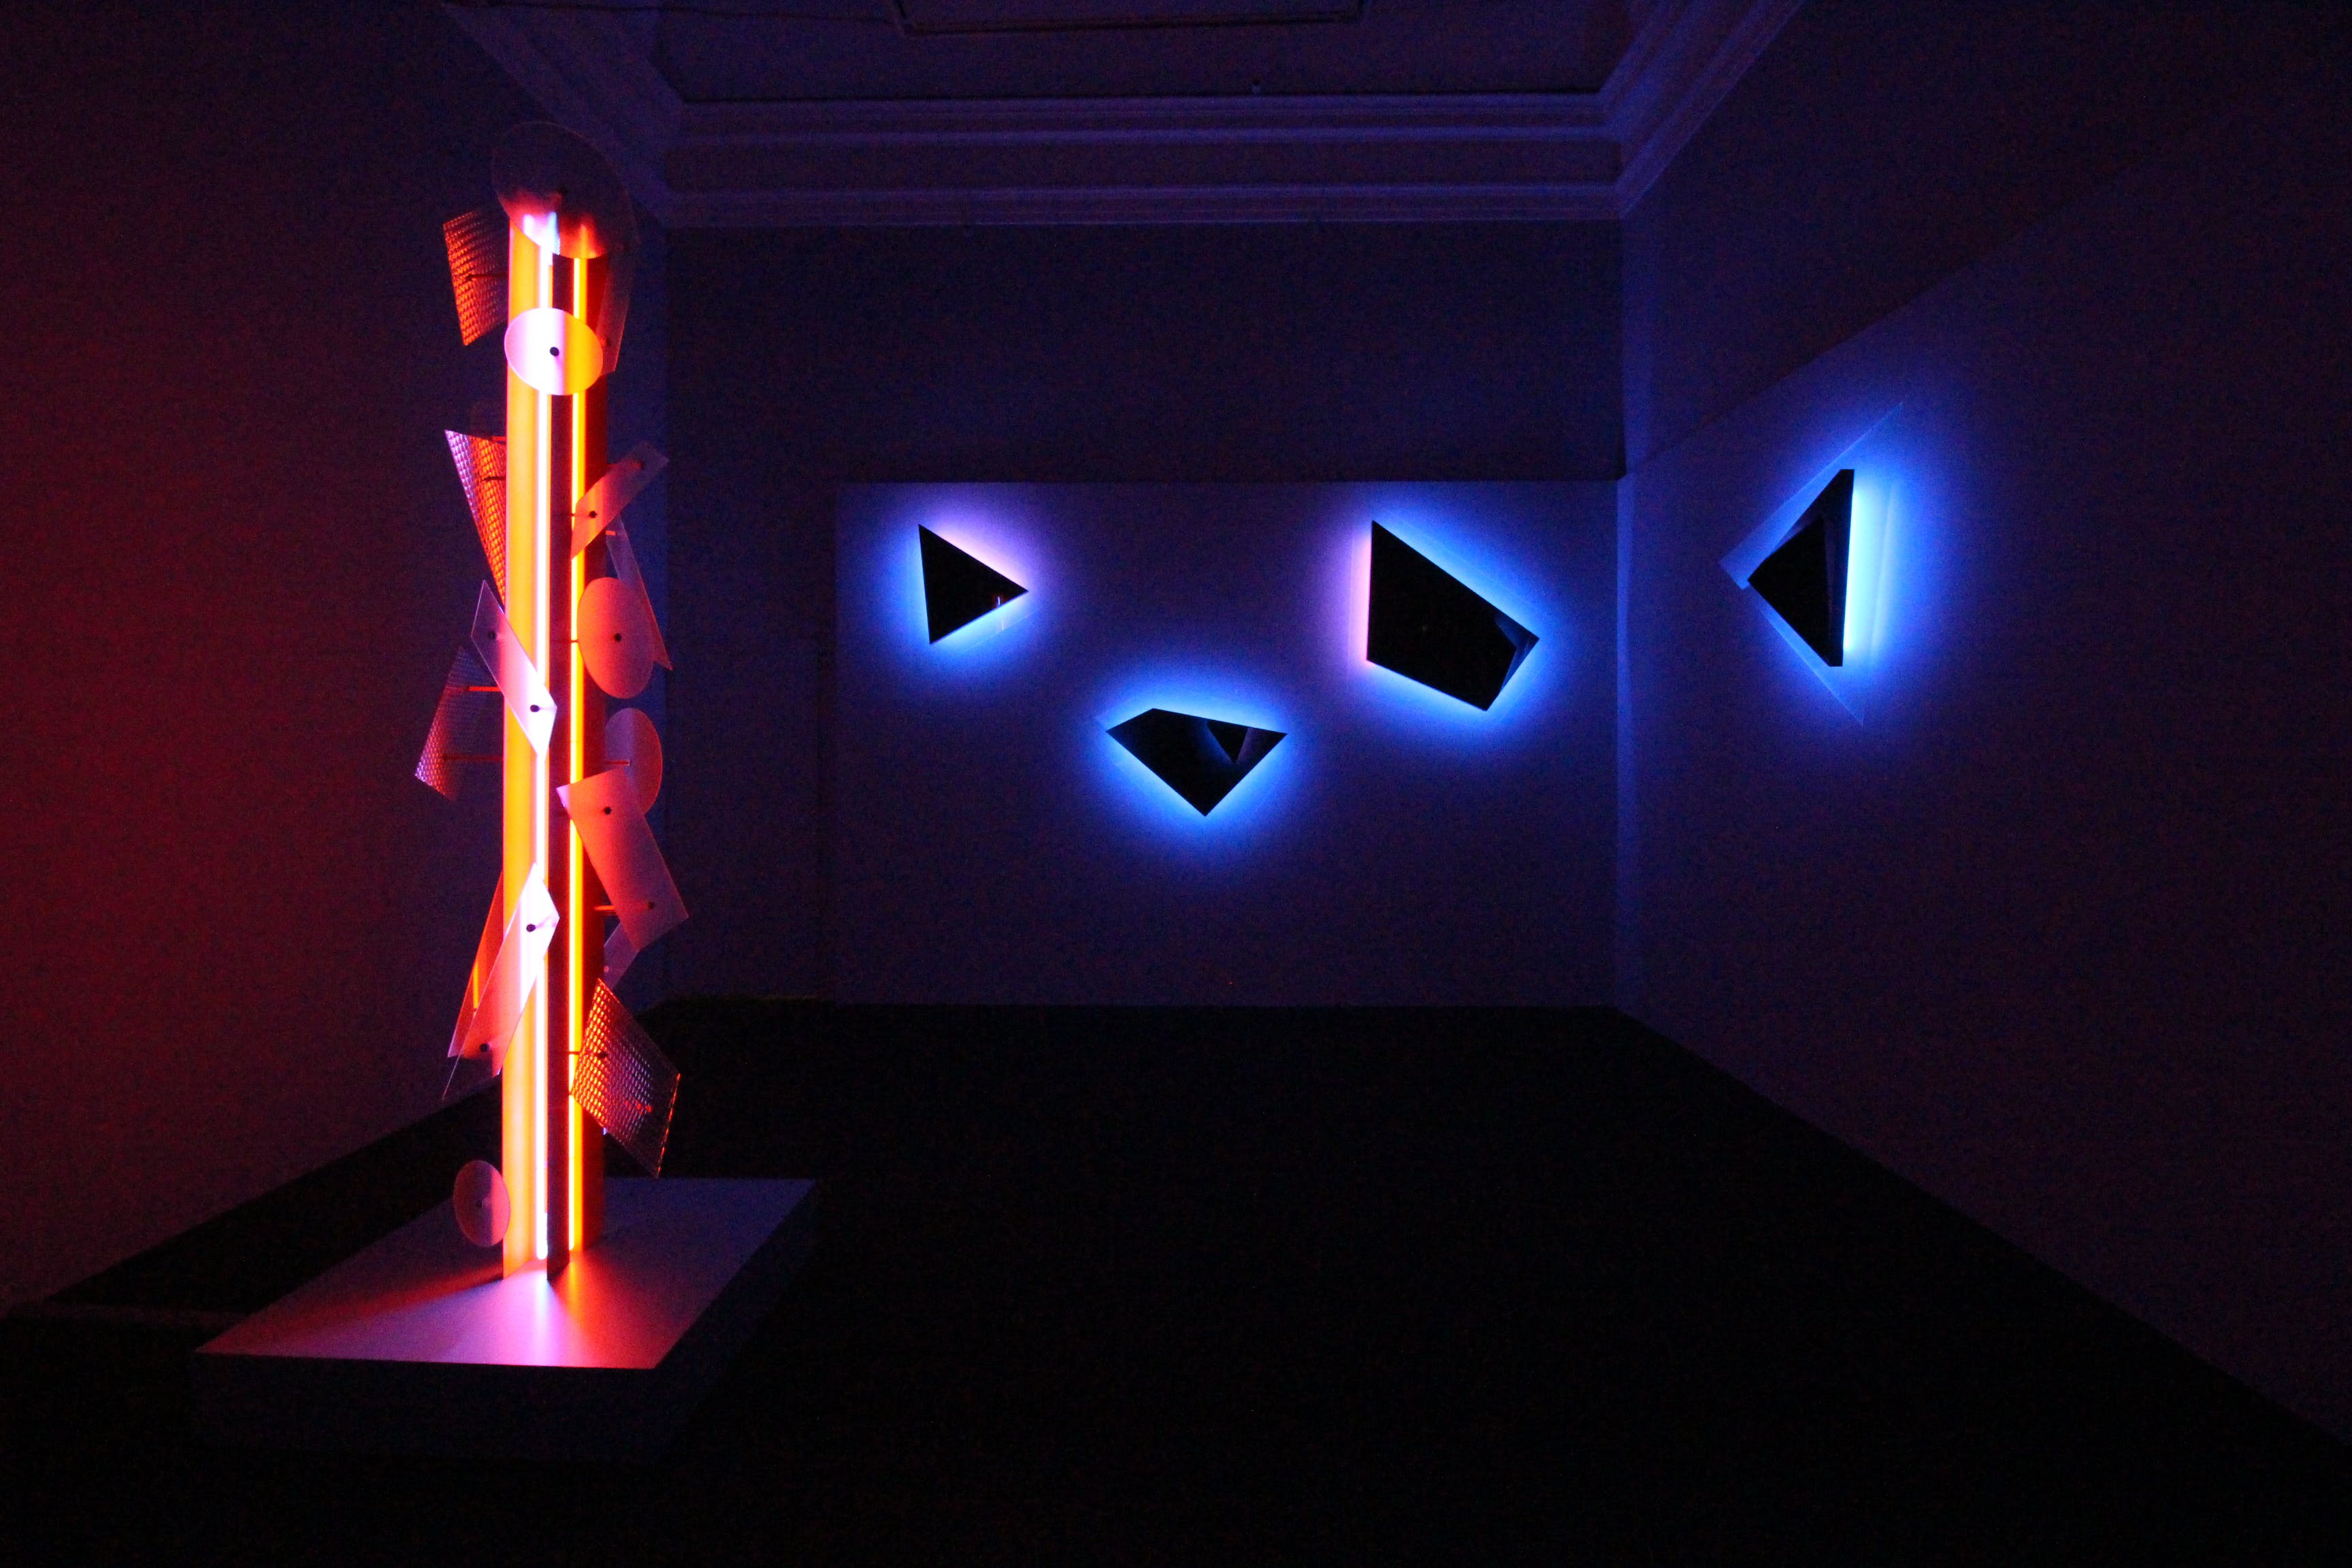 Nanda Vigo, Palazzo Reale, Milano, 2019, Neverended light e Galactica sky. Courtesy Archivio Nanda Vigo